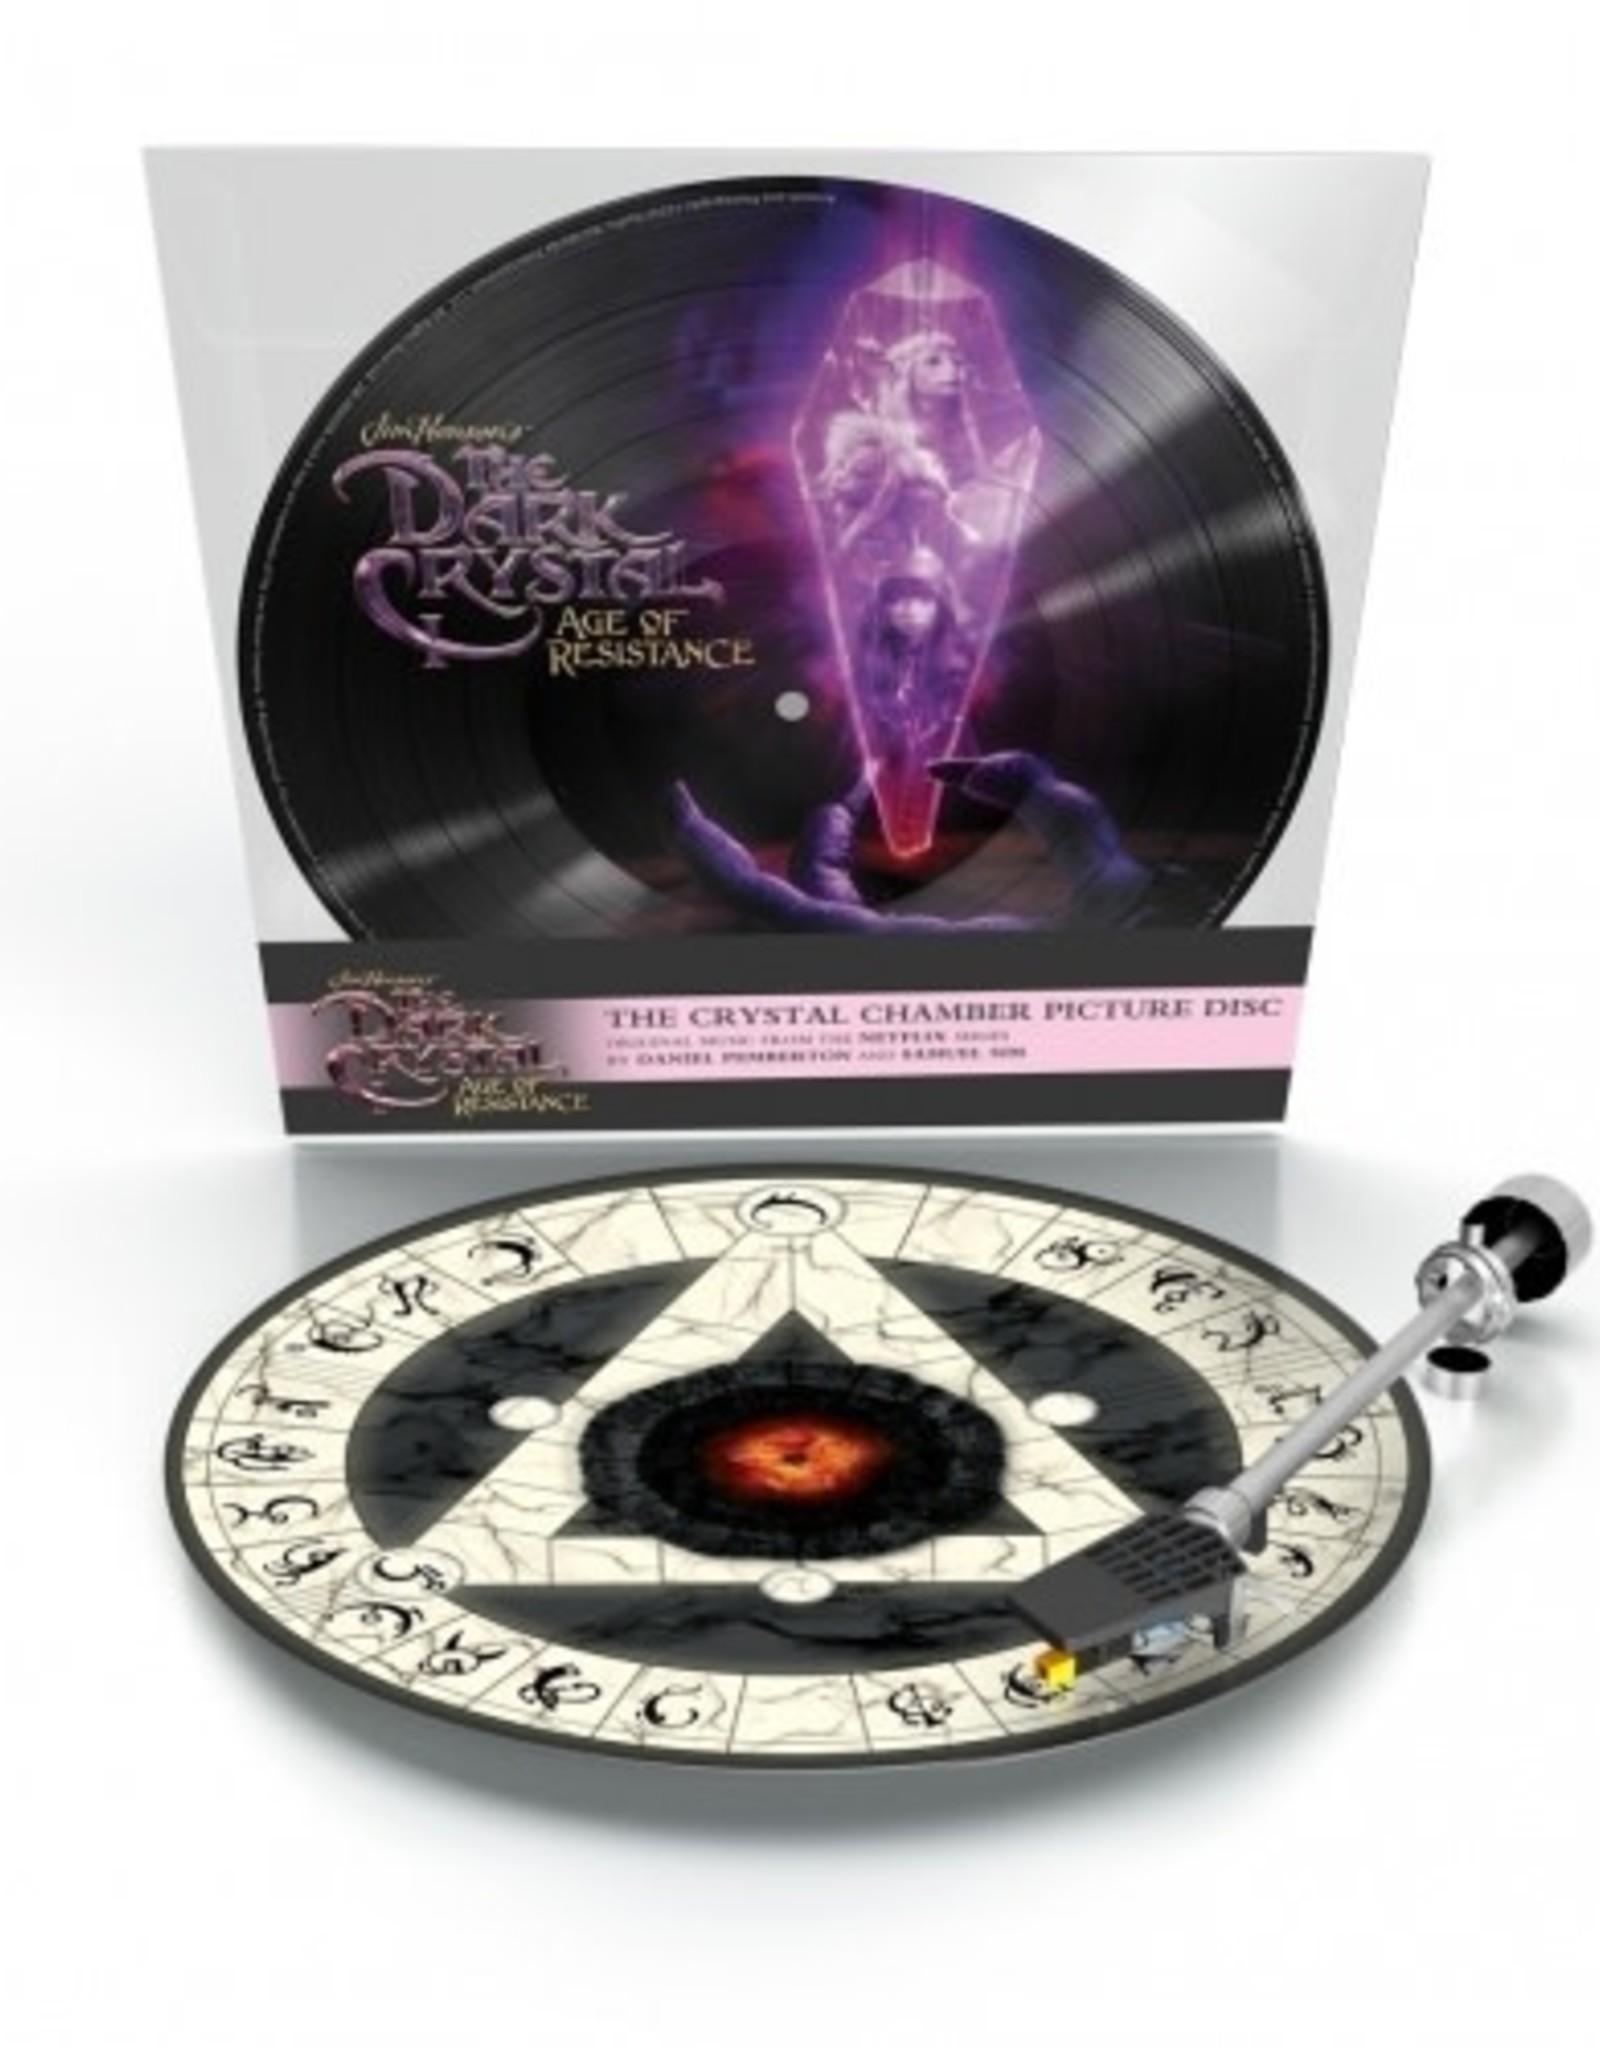 Sim Samuel; Daniel Pemberton - Dark Crystal: Age Of Resistance - The Crystal Chamber (Picture Disc)